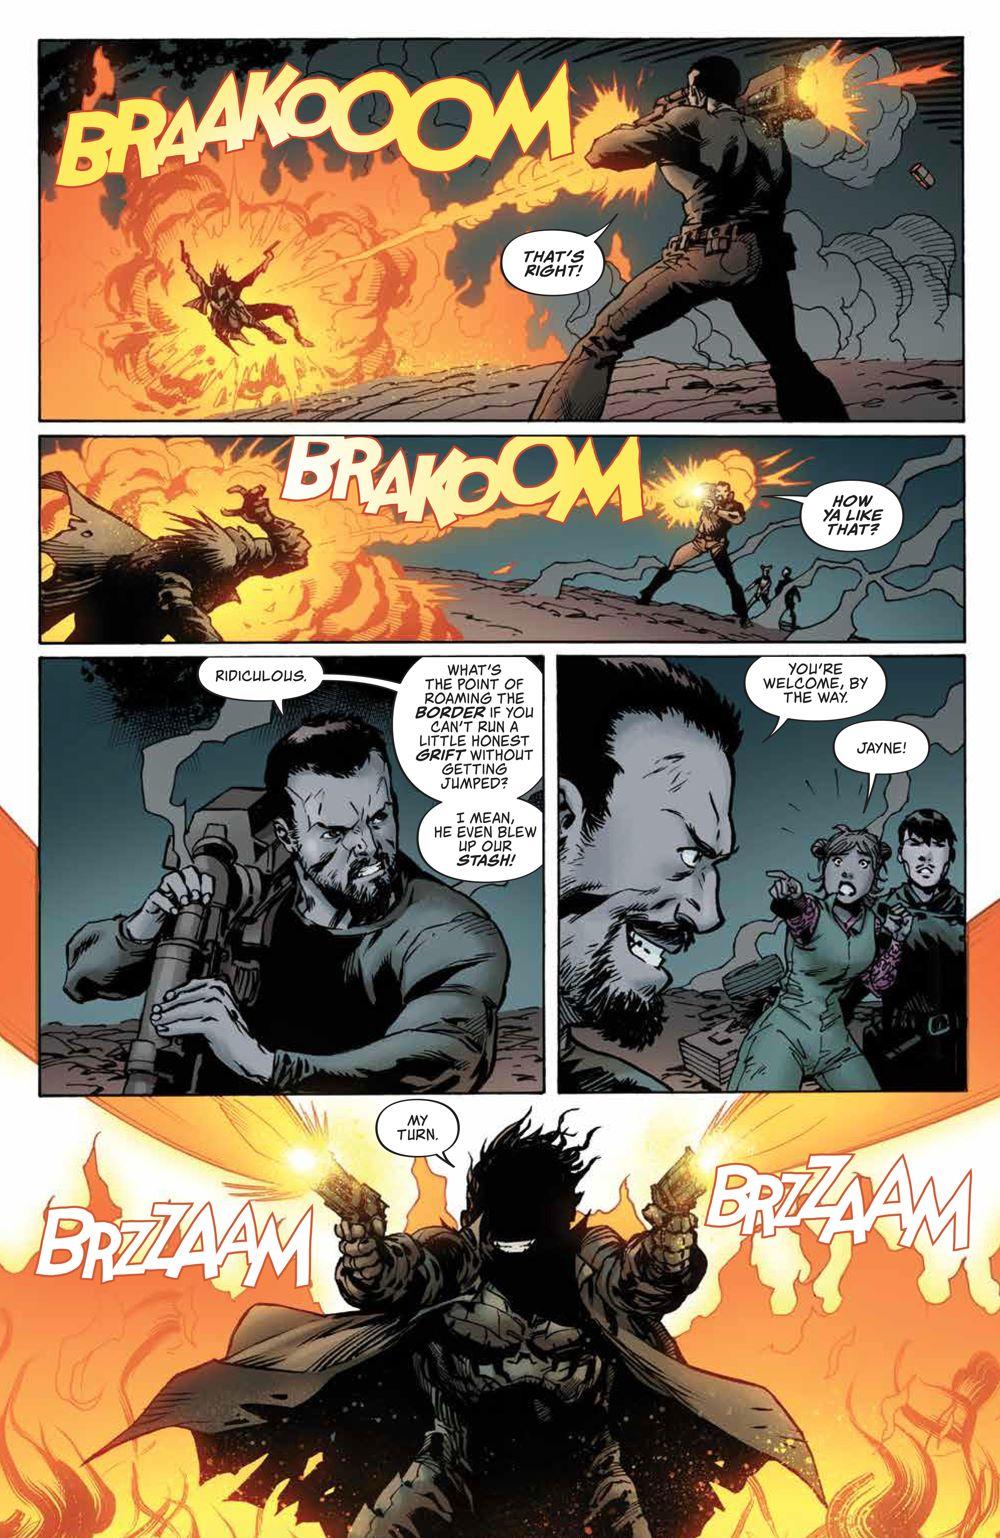 Firefly_NewSheriffVerse_v2_HC_PRESS_12 ComicList Previews: FIREFLY NEW SHERIFF IN THE 'VERSE VOLUME 2 HC